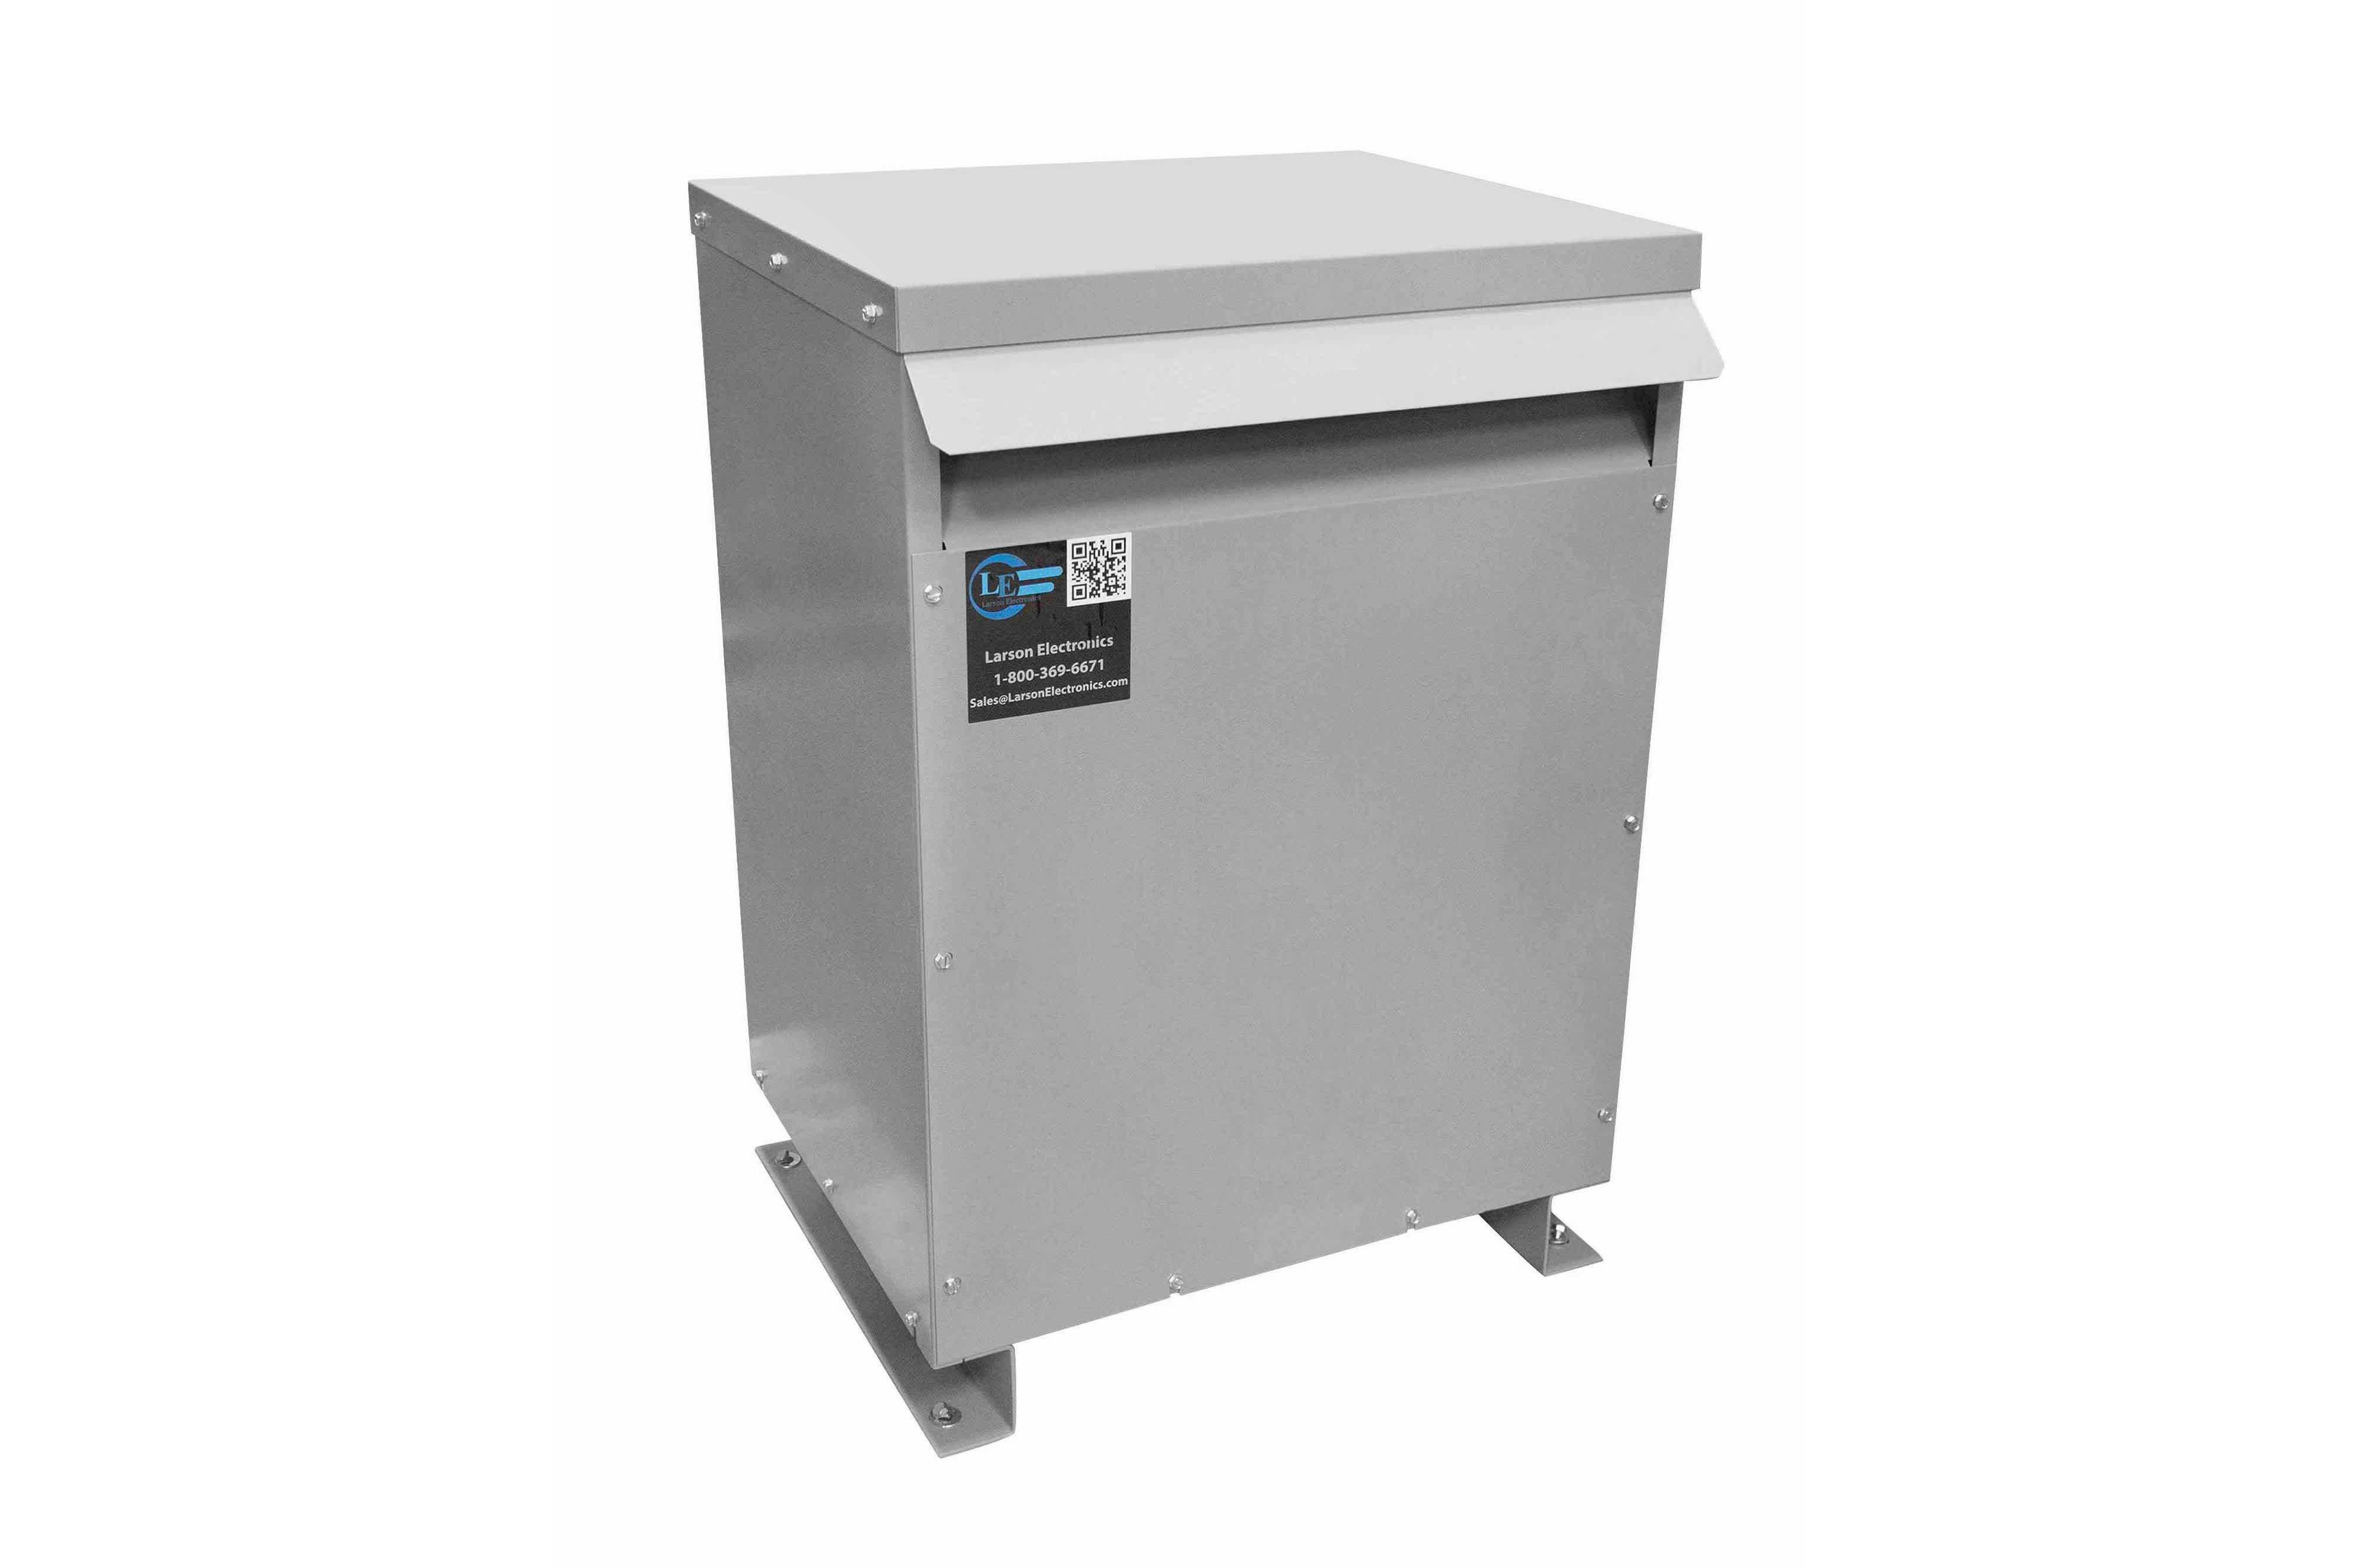 26 kVA 3PH Isolation Transformer, 415V Wye Primary, 480Y/277 Wye-N Secondary, N3R, Ventilated, 60 Hz